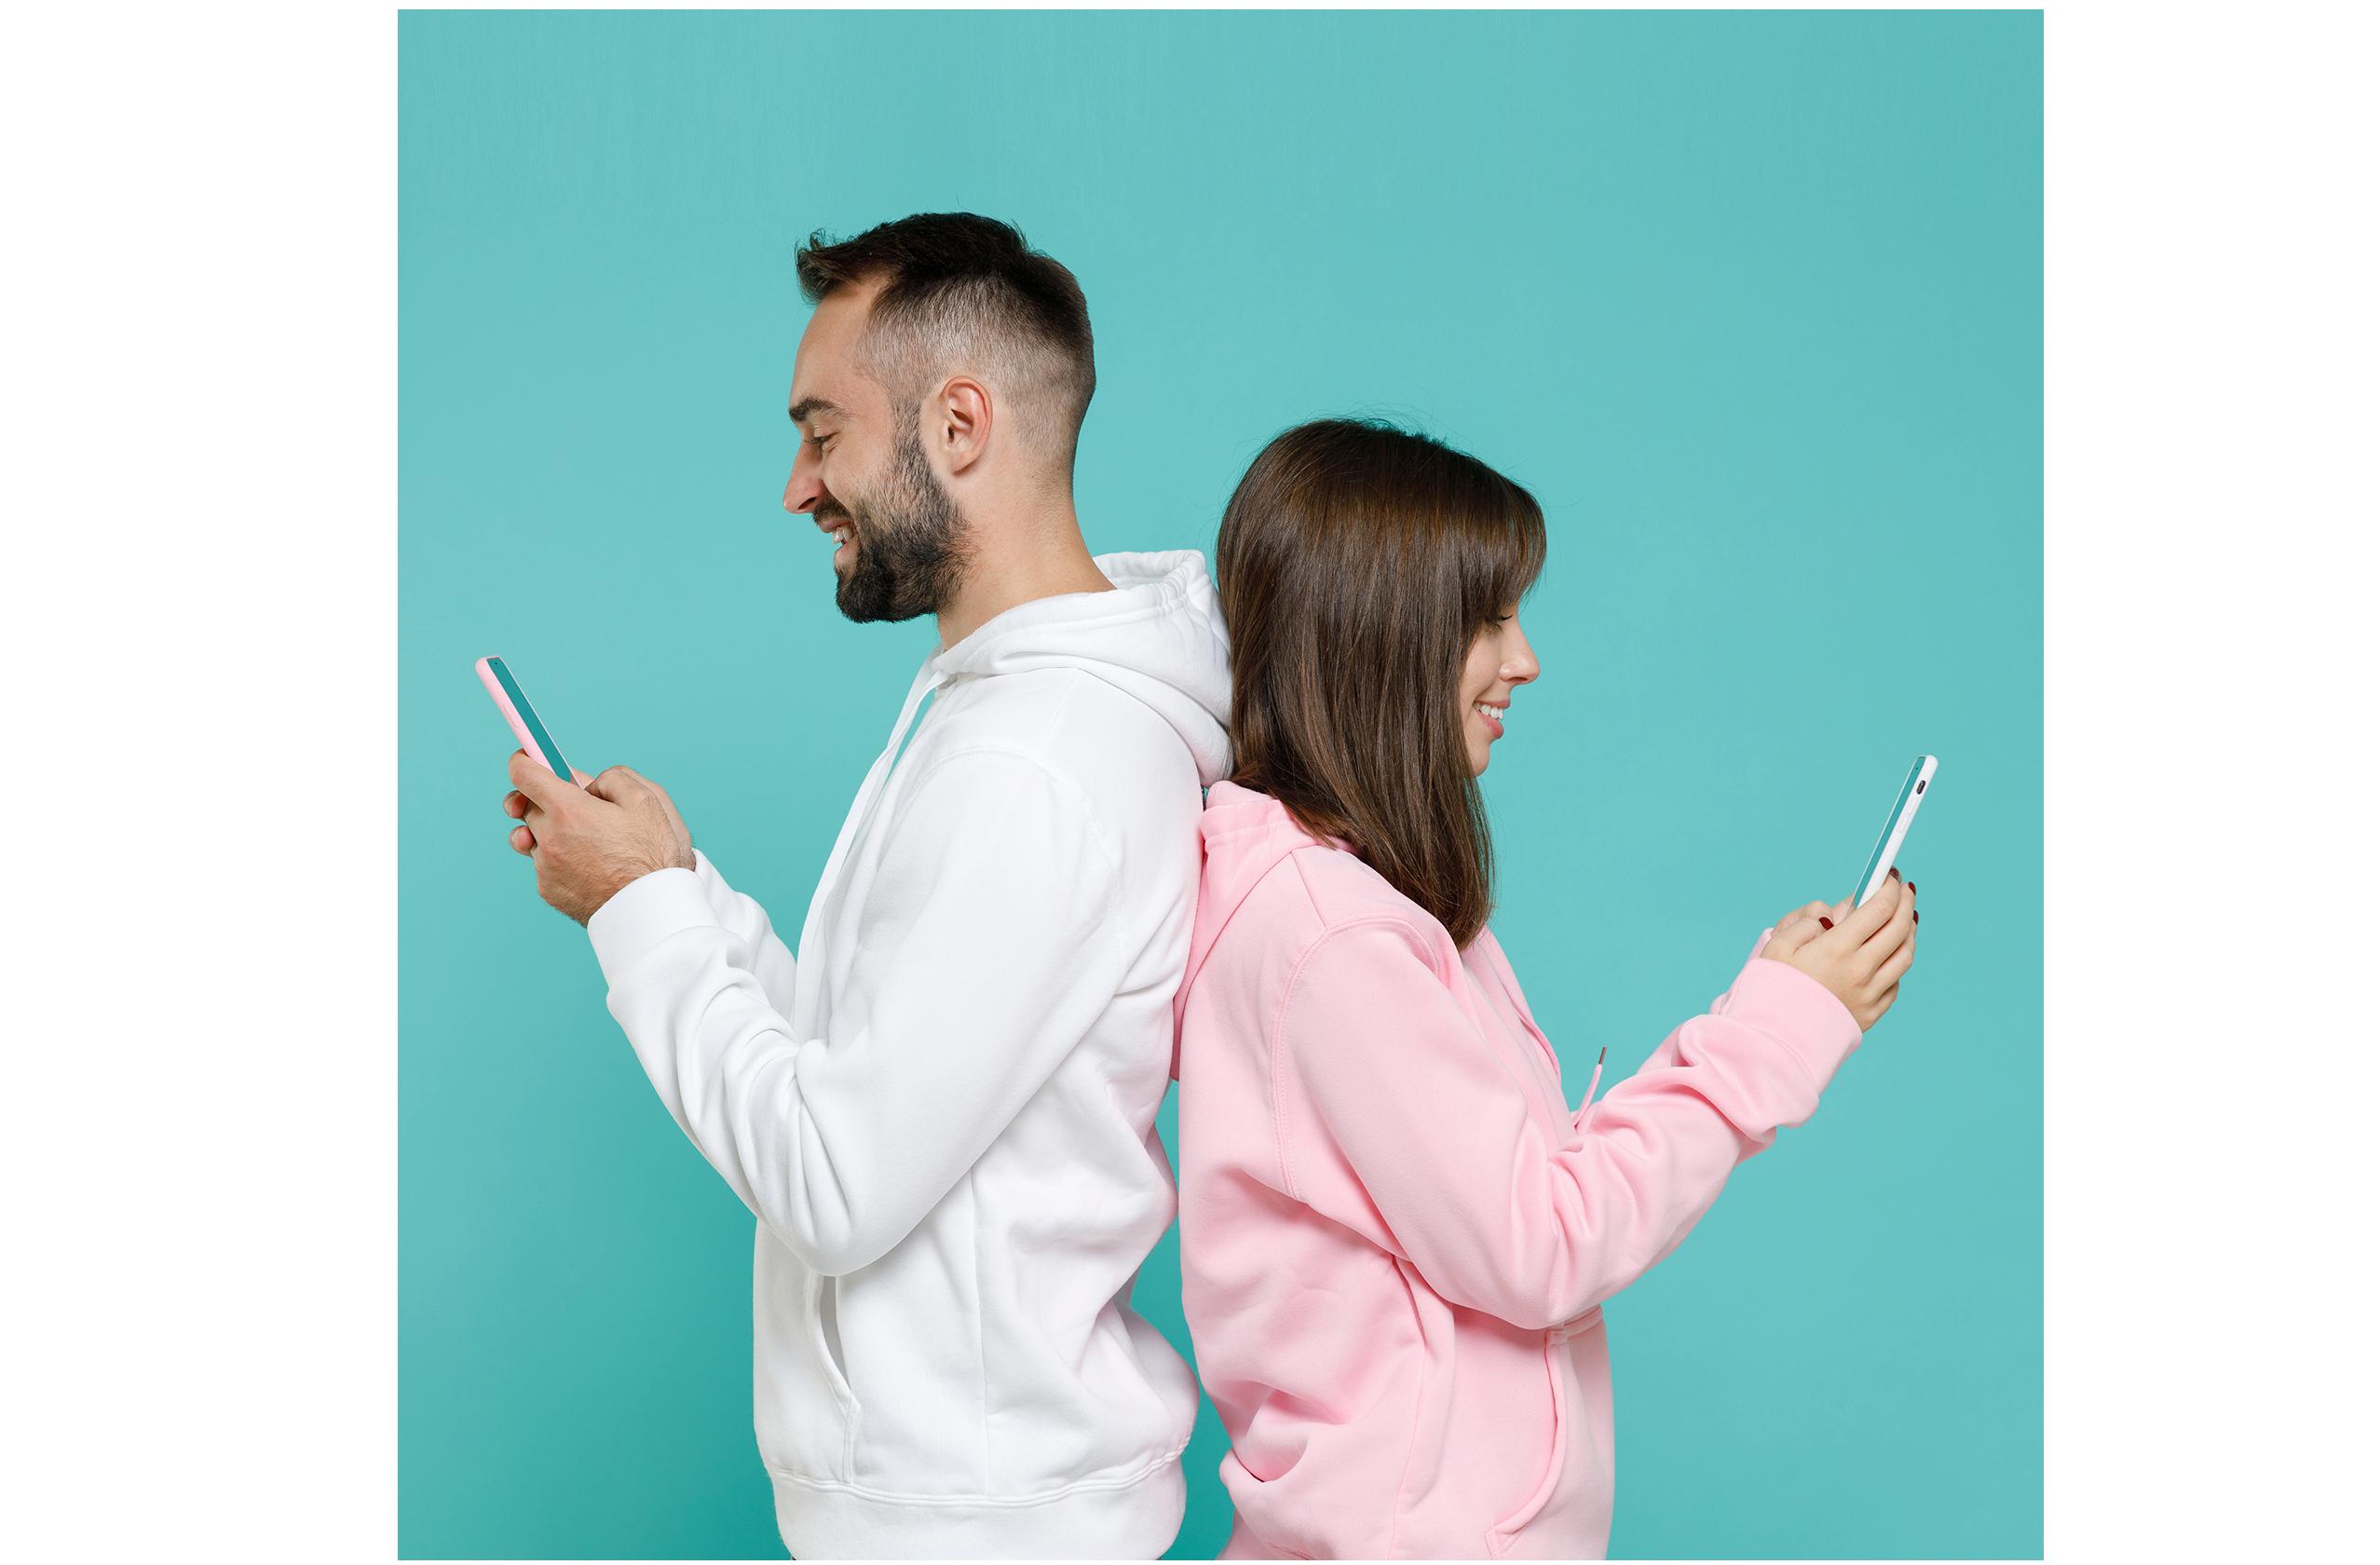 App di incontri online: sicurezza e privacy nel 2021   Blog ufficiale di Kaspersky